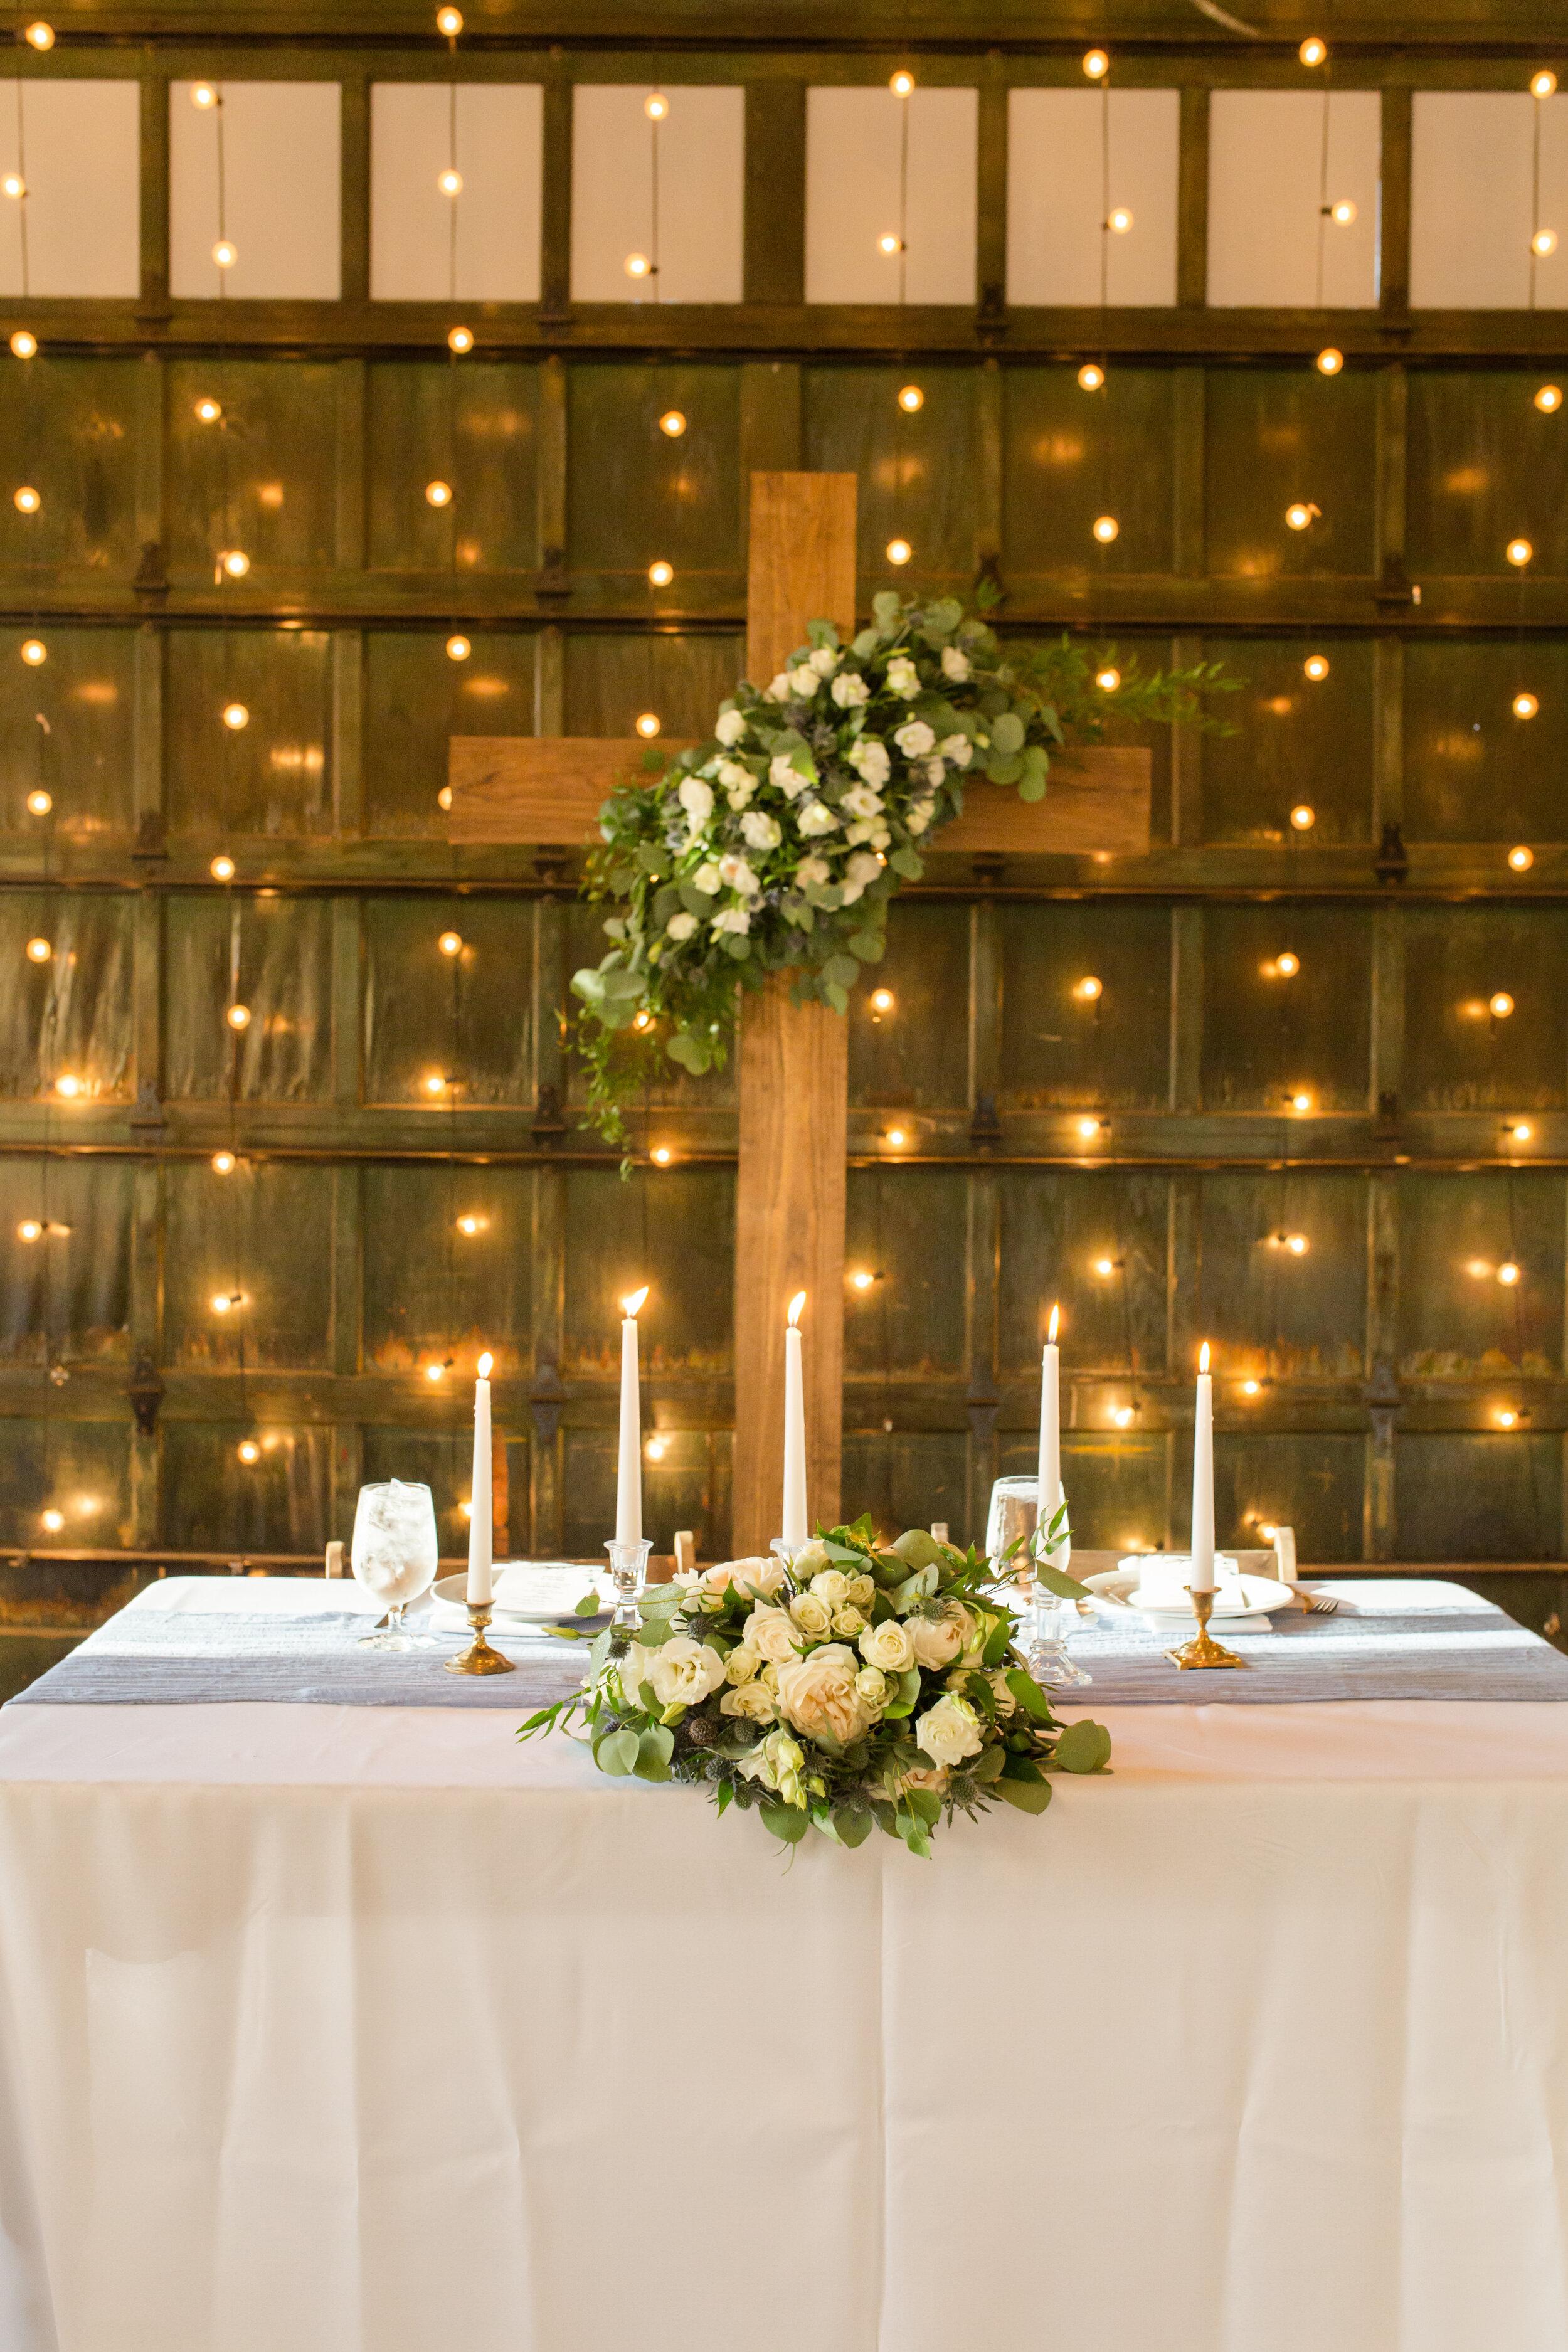 ivory-and-beau-bride-wedding-dresses-bridal-boutique-bridal-shop-savannah-wedding-shop-DGP_SohoSouthCafe_Swanagin-Mullis-508.JPG